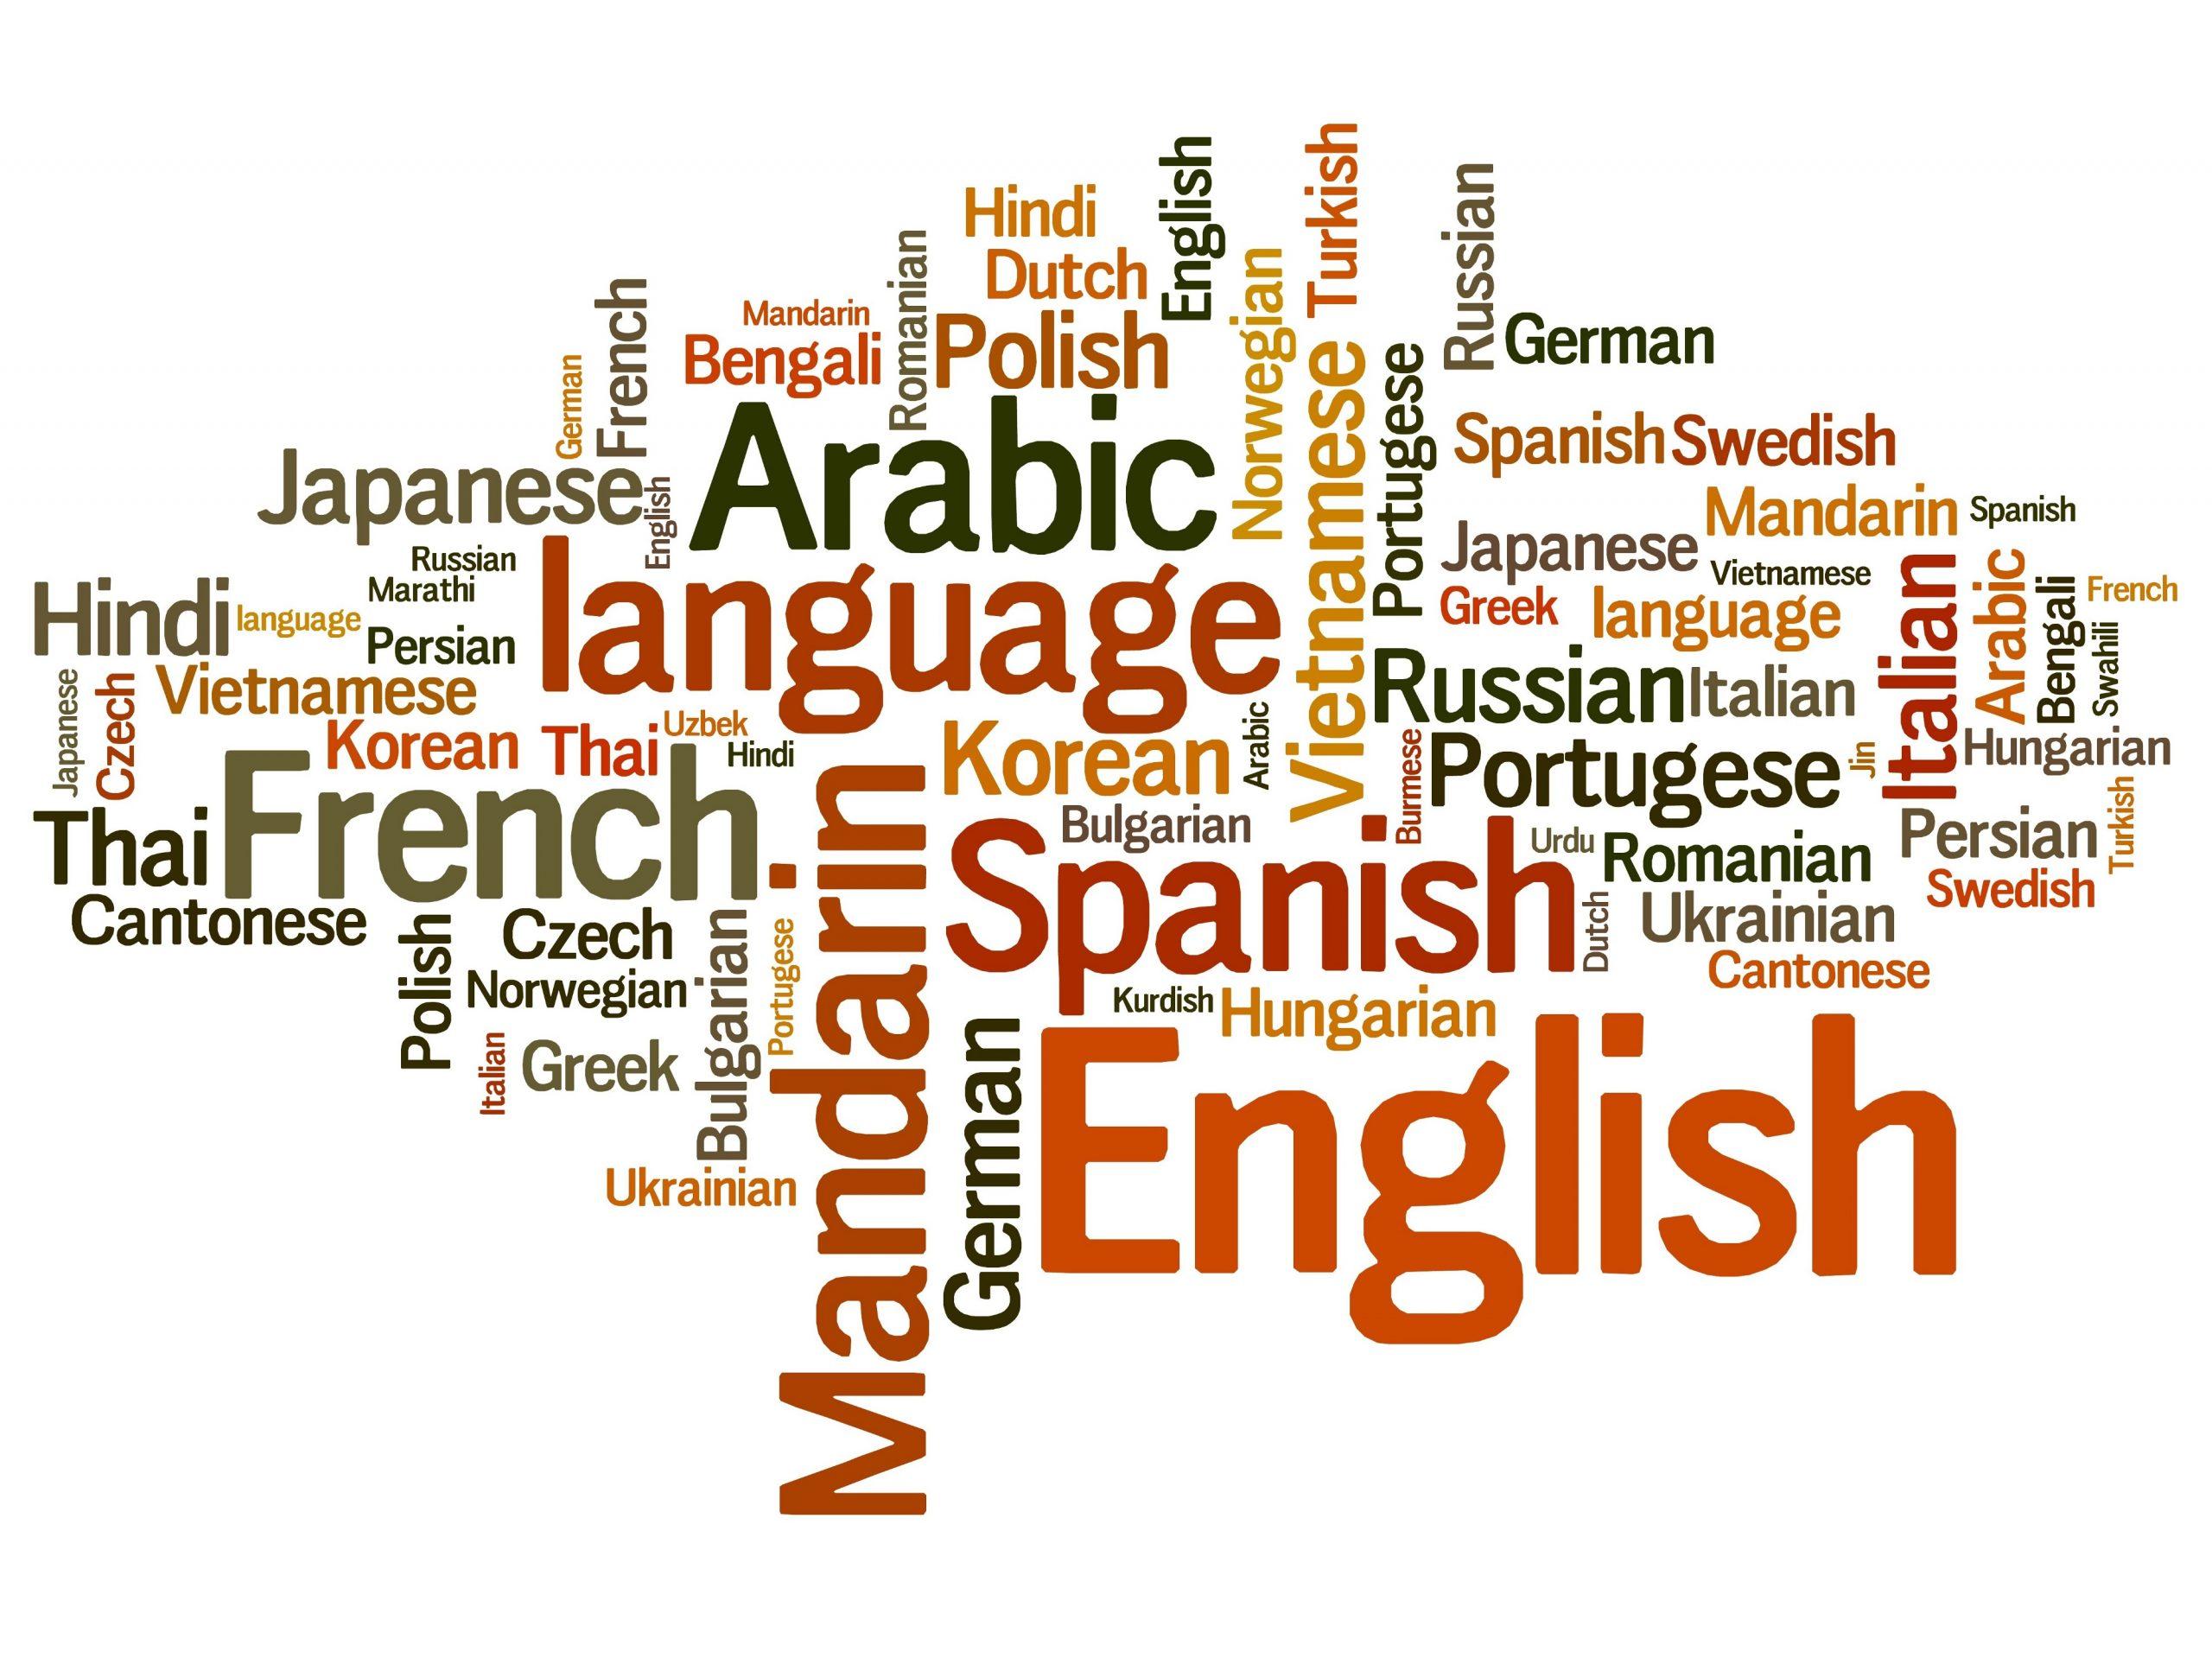 1. Language